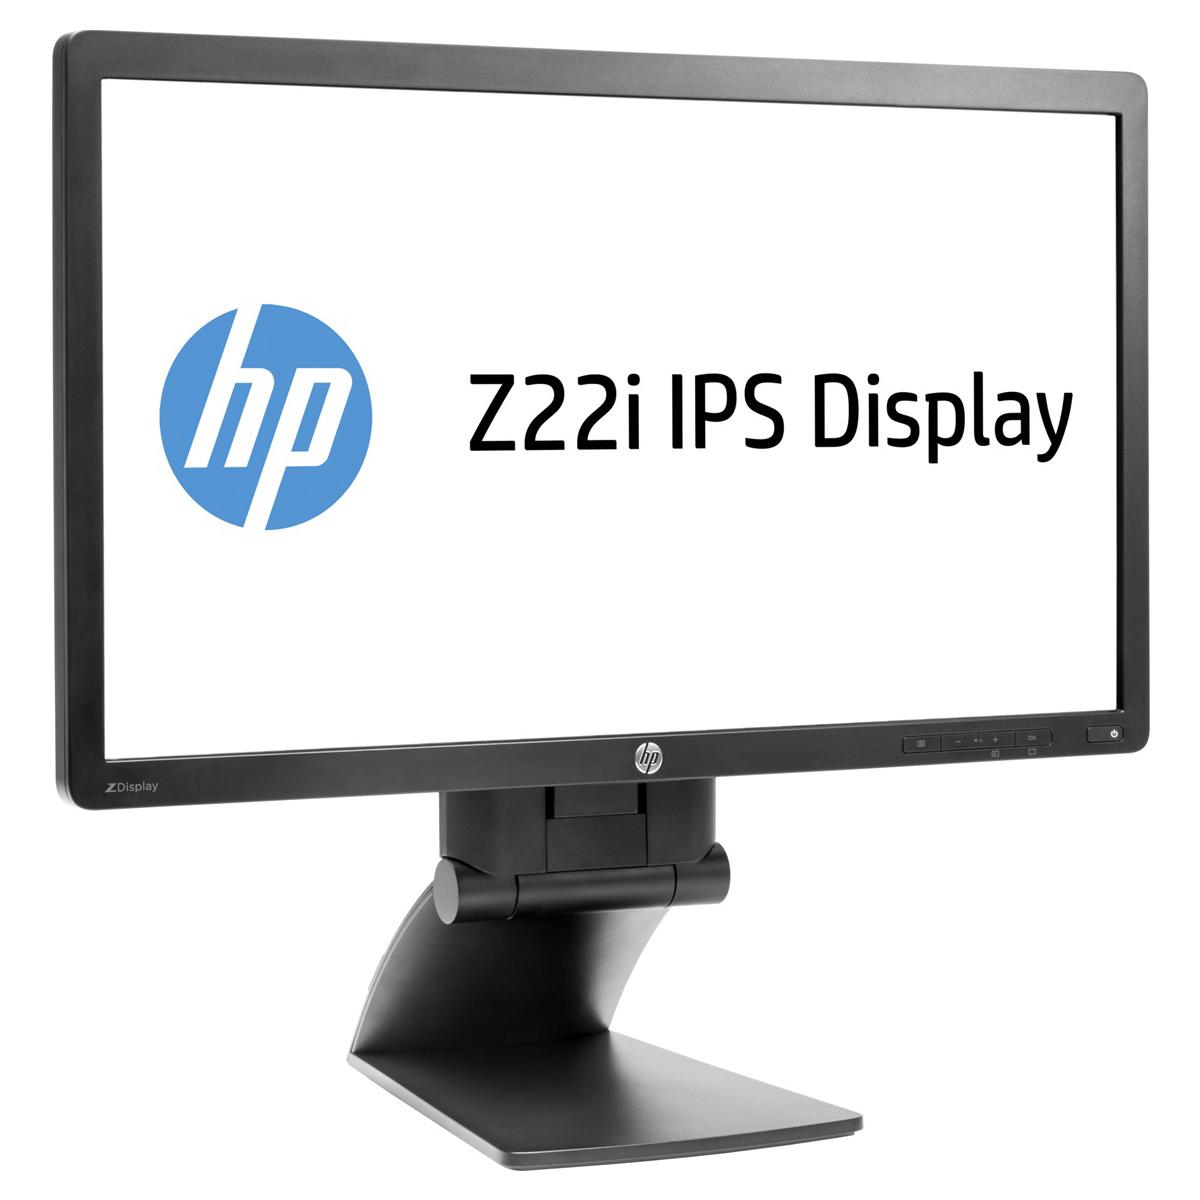 "Ecran PC HP 21.5"" LED - Z22i (D7Q14AT) 1920 x 1080 pixels - 8 ms (gris à gris) - Format large 16/9 - Dalle IPS - DisplayPort - Hub USB - Noir"